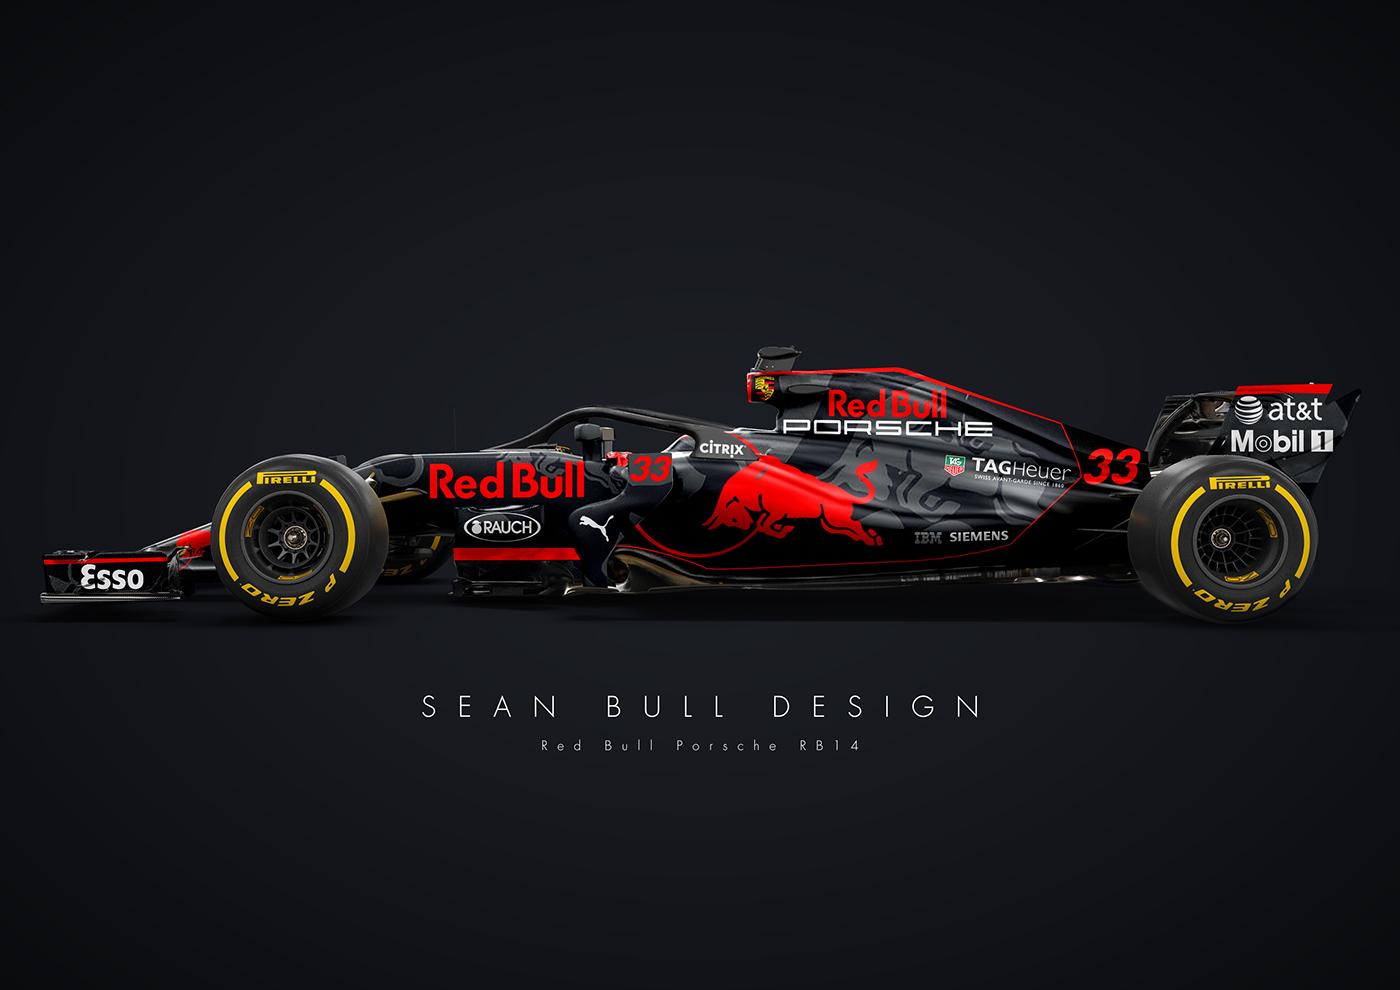 Mercedes New Cars Hd Wallpapers Red Bull Porsche 2018 F1 Concept On Behance